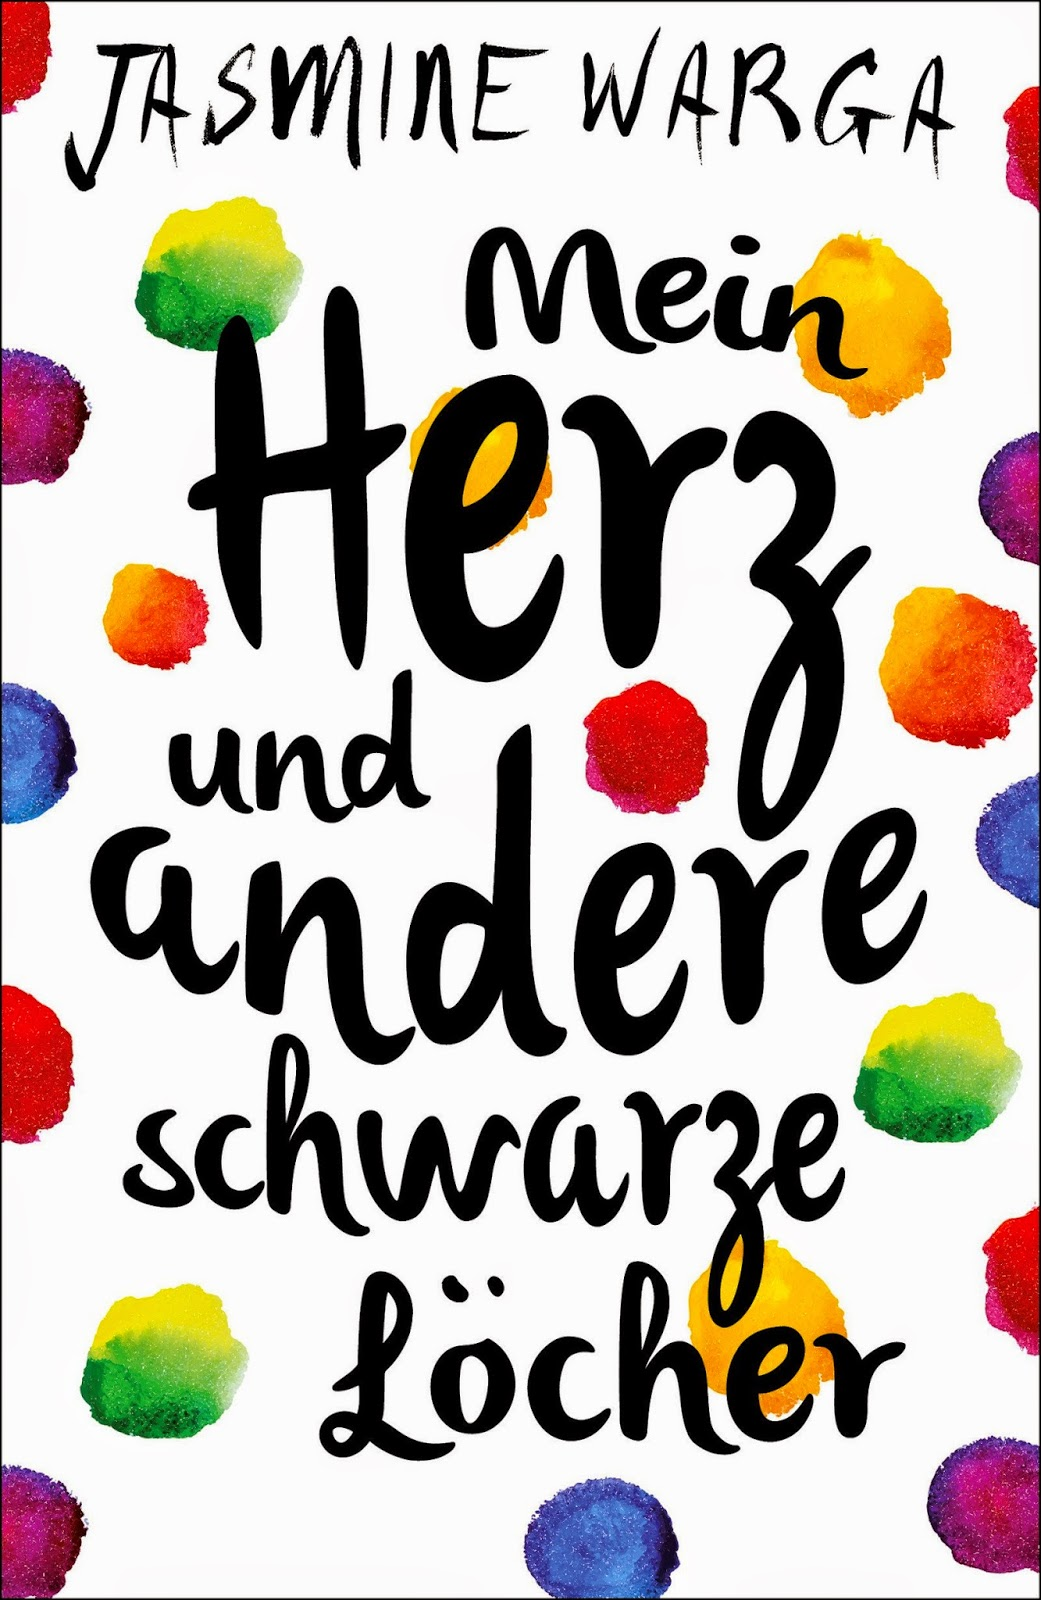 http://www.amazon.de/Mein-Herz-andere-schwarze-L%C3%B6cher/dp/3737351414/ref=sr_1_1_twi_1_har?s=books&ie=UTF8&qid=1429966988&sr=1-1&keywords=mein+herz+und+andere+schwarze+l%C3%B6cher